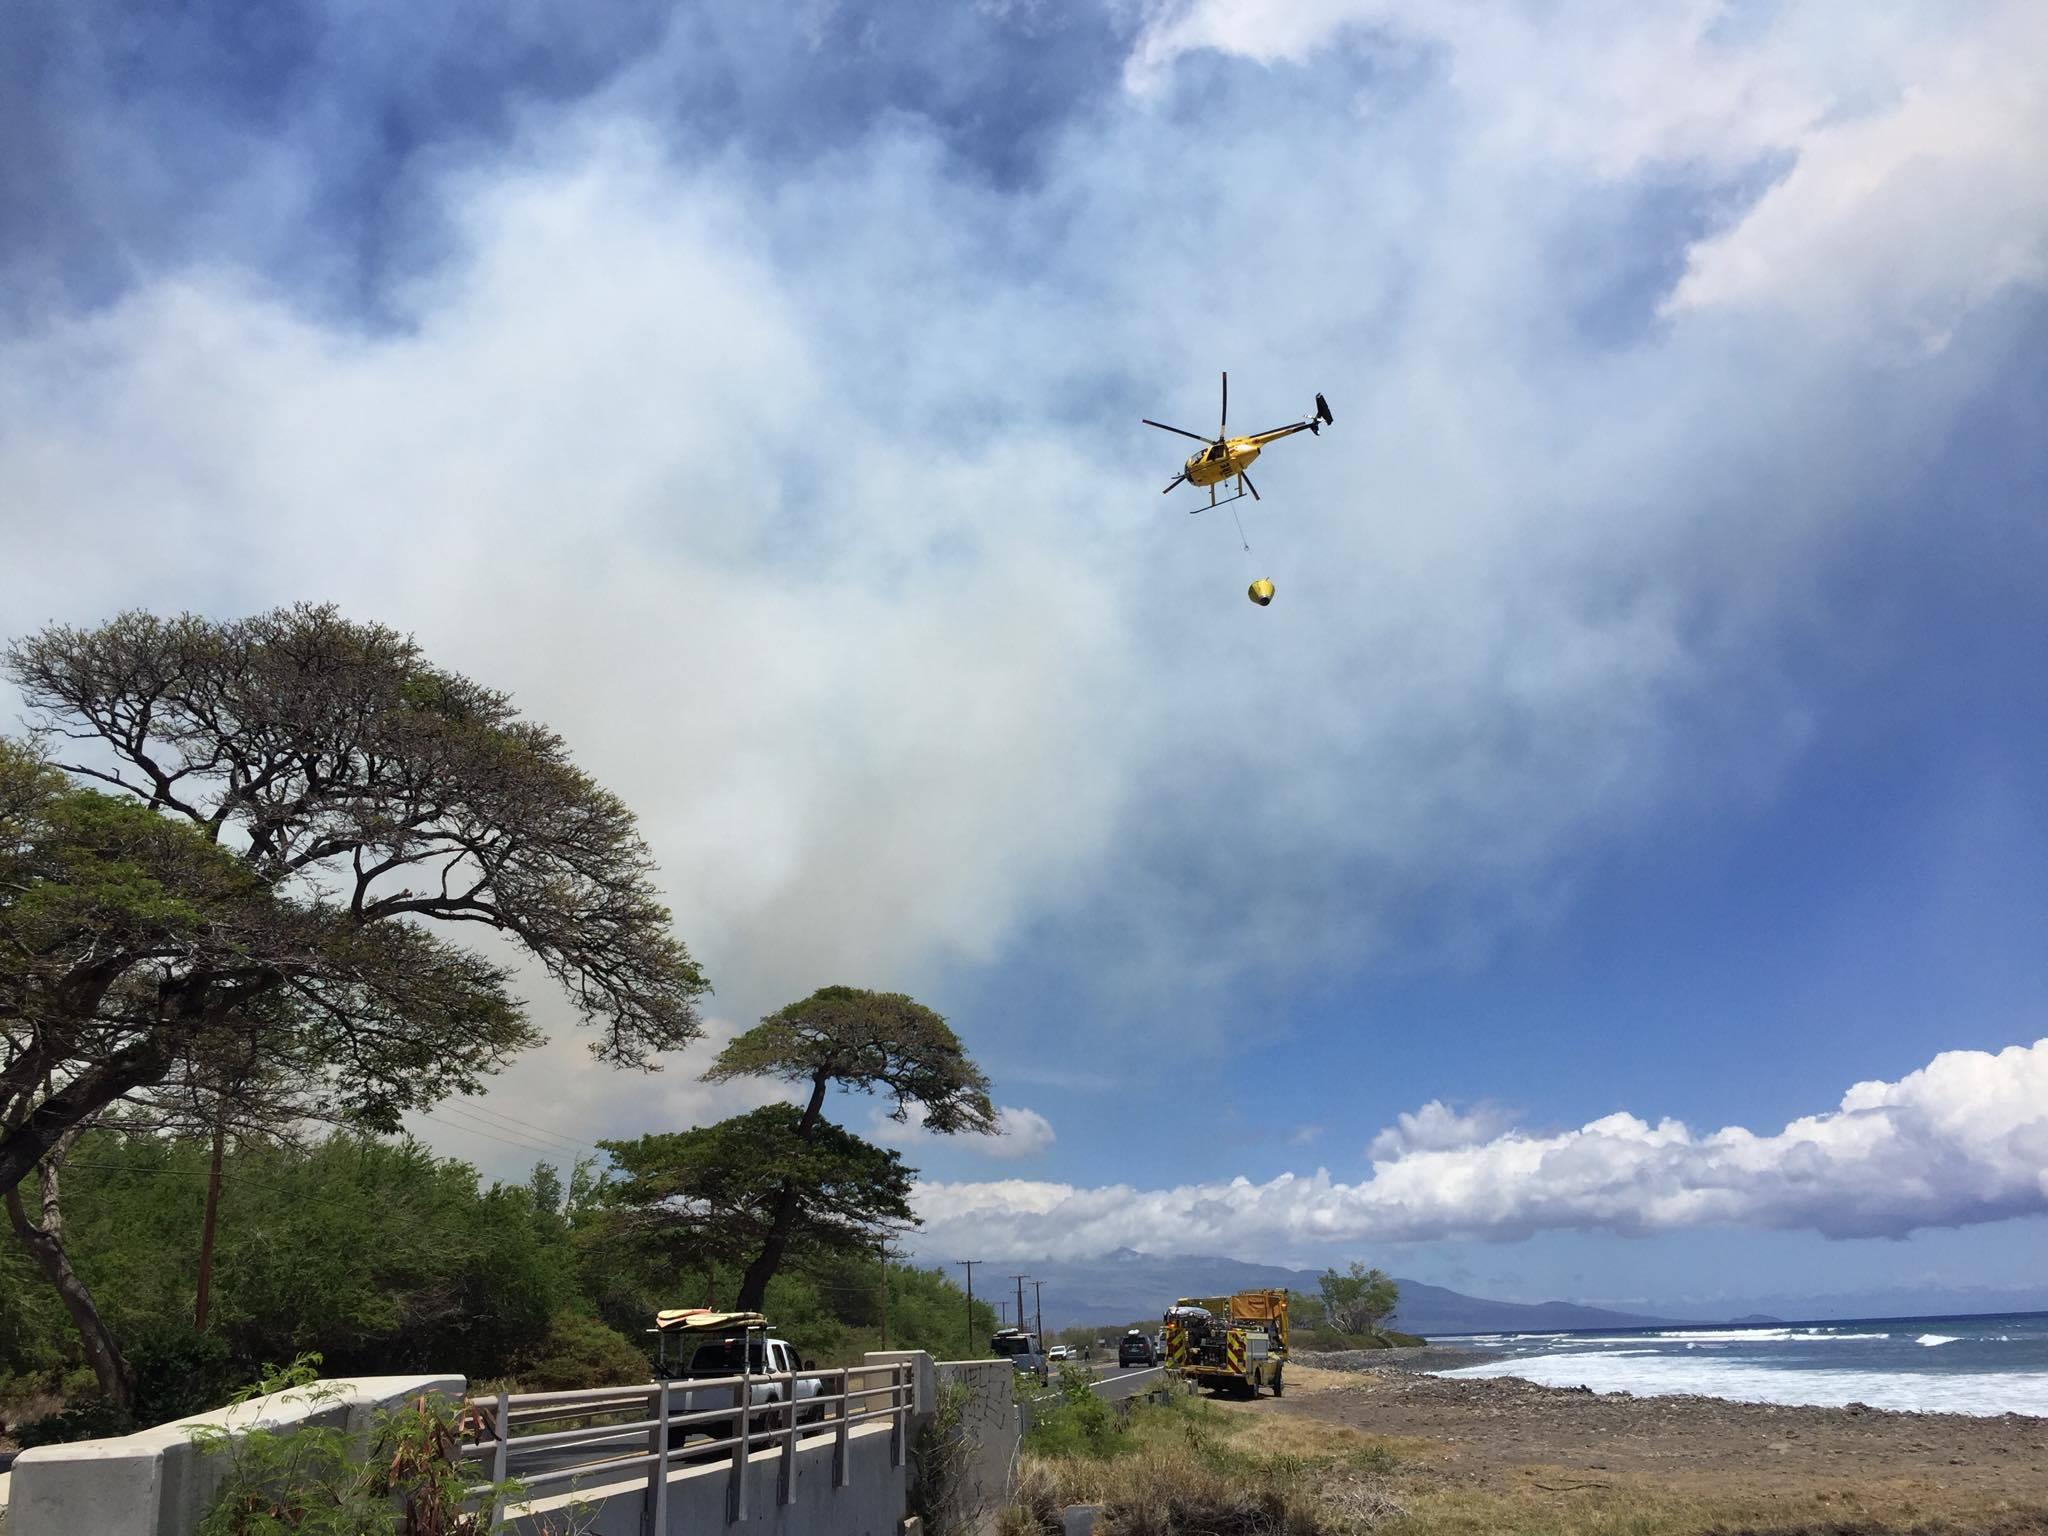 Ukumehame Fire on June 22, 2016. Photo Credit: Timothy Lara / Maui Now contributor